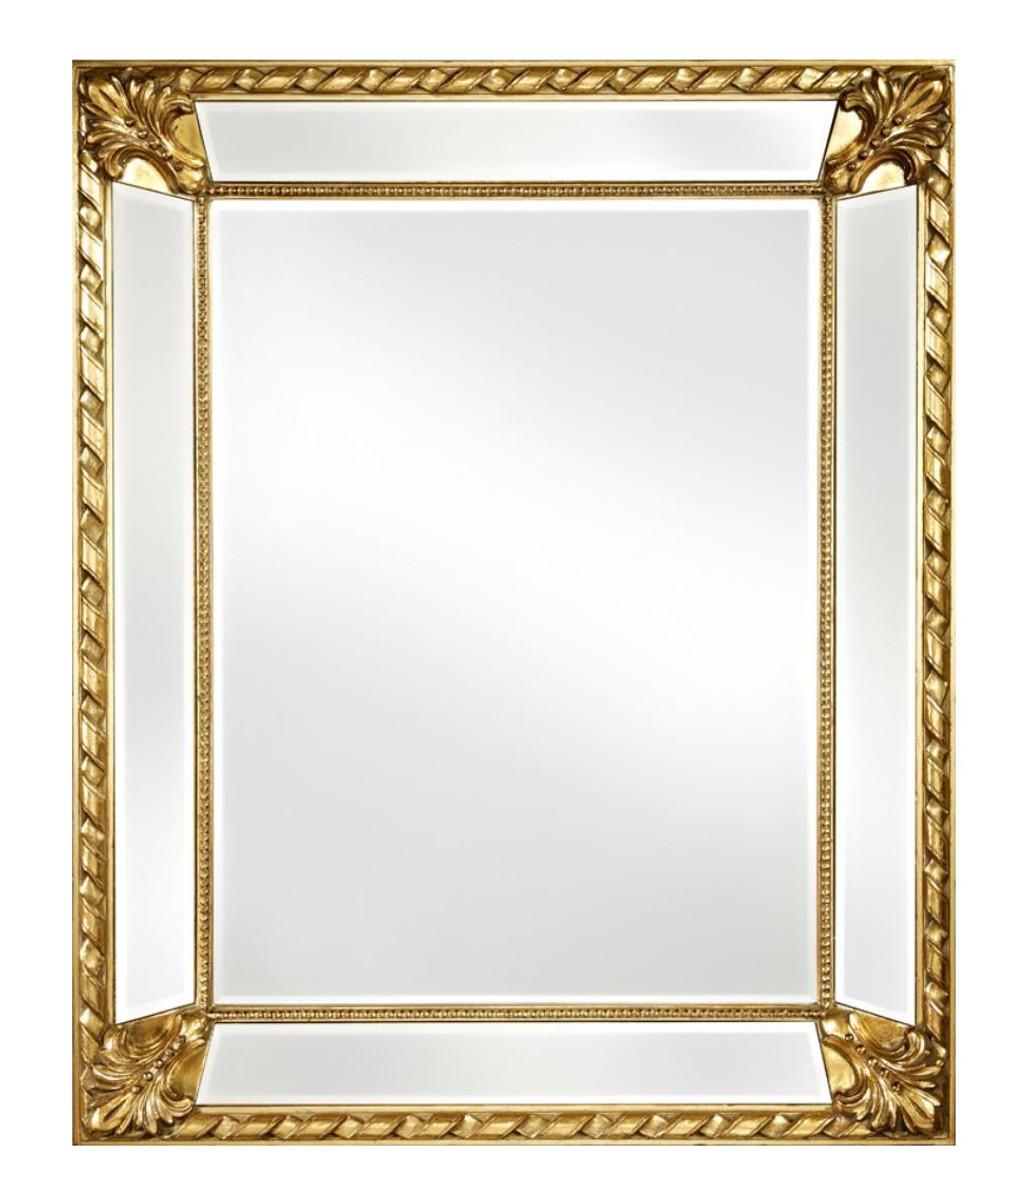 casa padrino barock spiegel gold 91 x h 112 cm barock wohnzimmerm bel spiegel barock spiegel. Black Bedroom Furniture Sets. Home Design Ideas